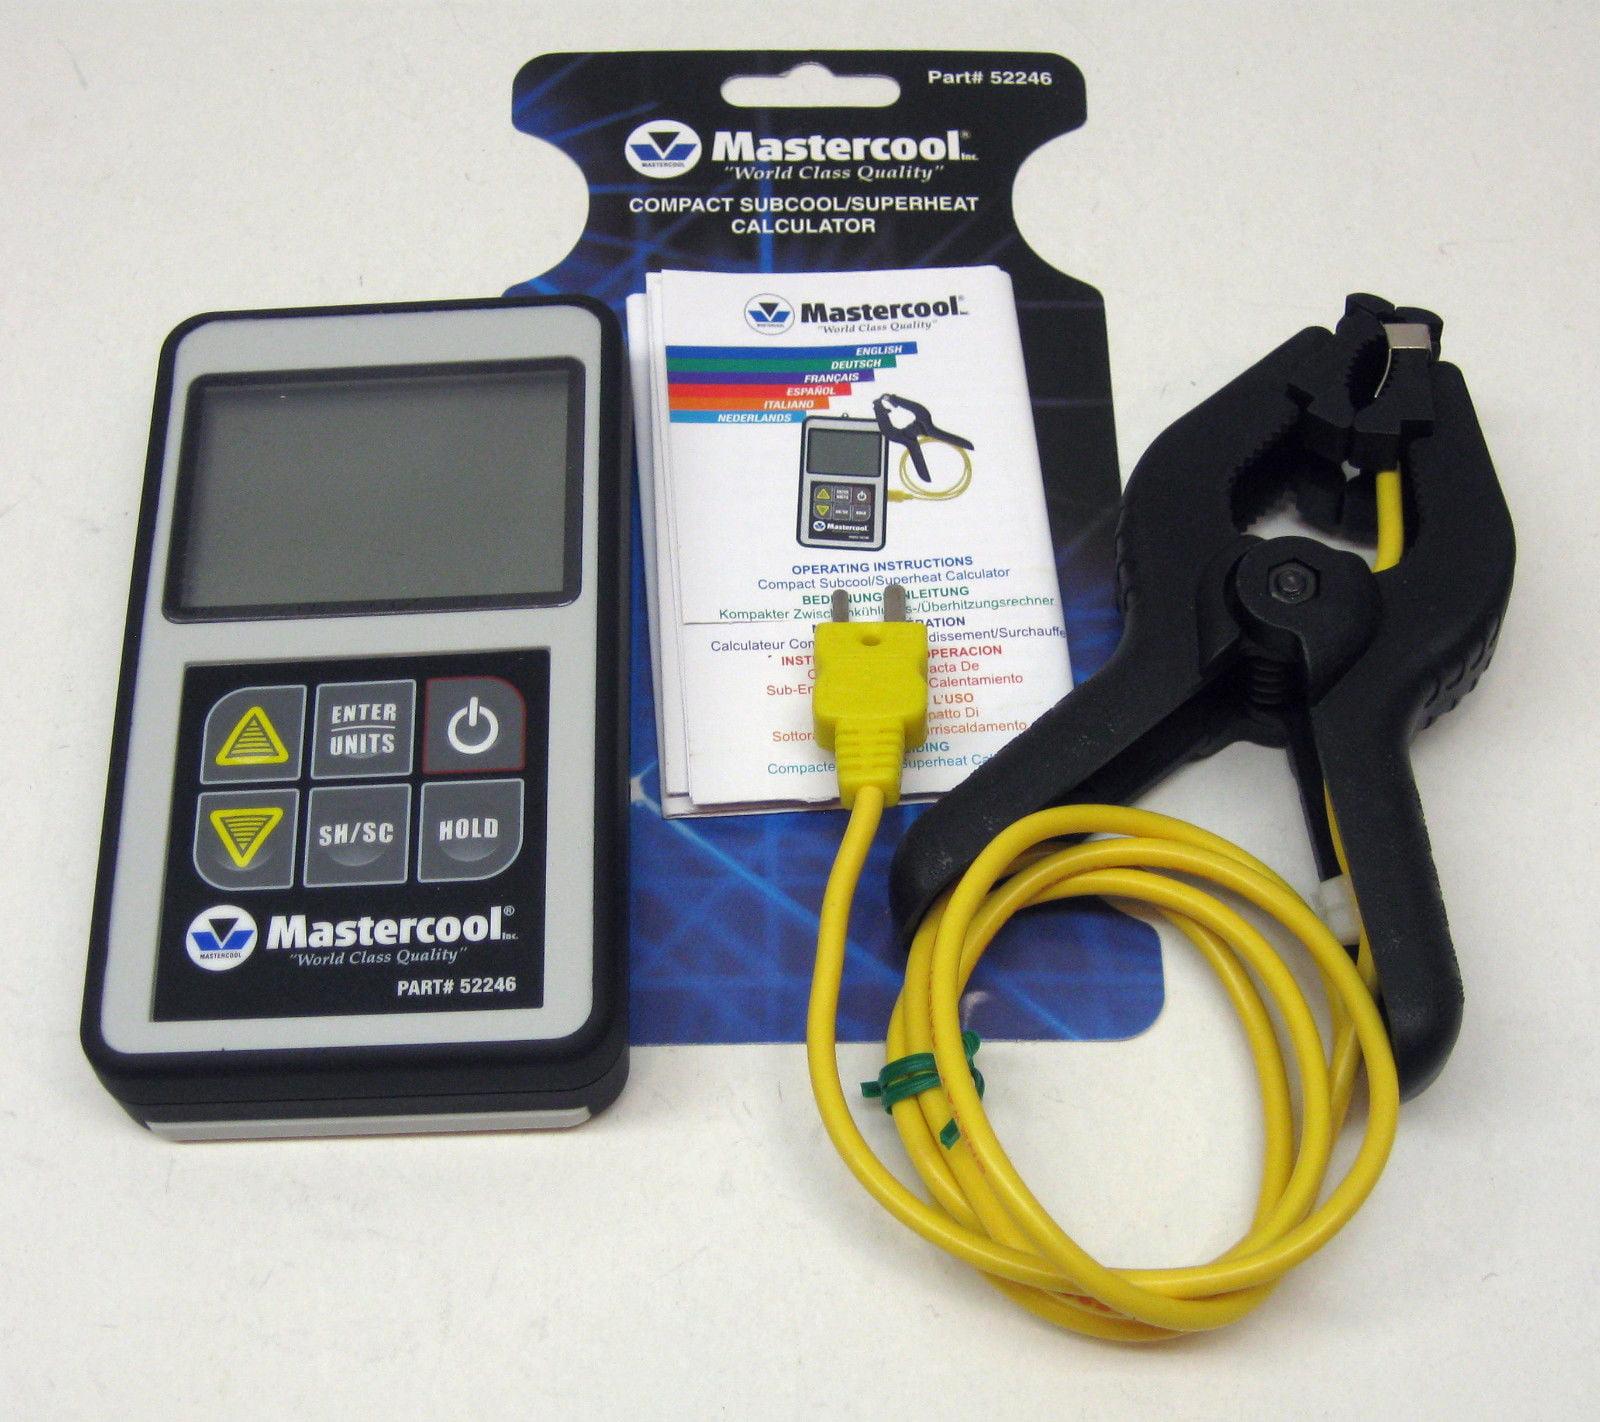 52246 Mastercool Superheat Subcool Calculator Digital A C HVAC Refrigeration by Mastercool